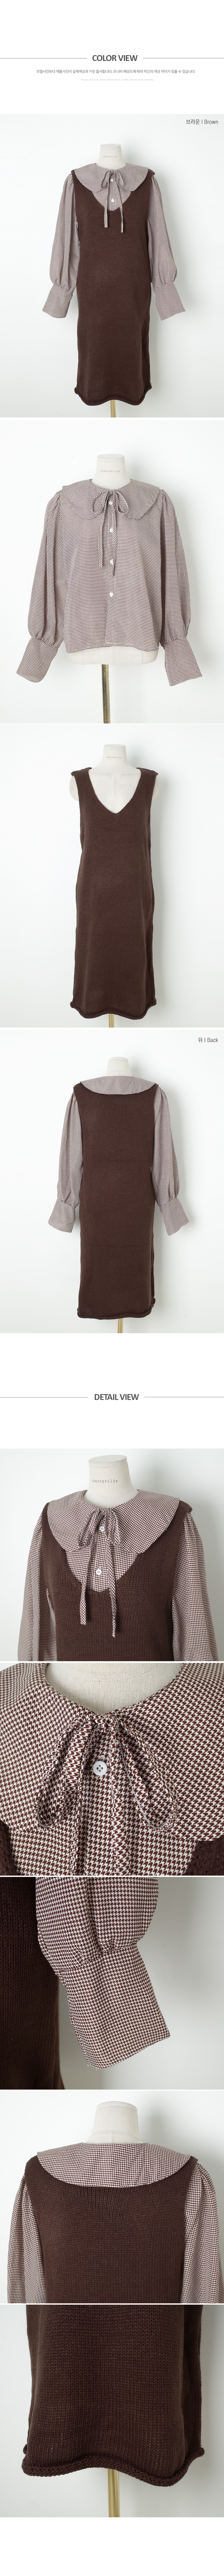 Daily dress + blouse SET